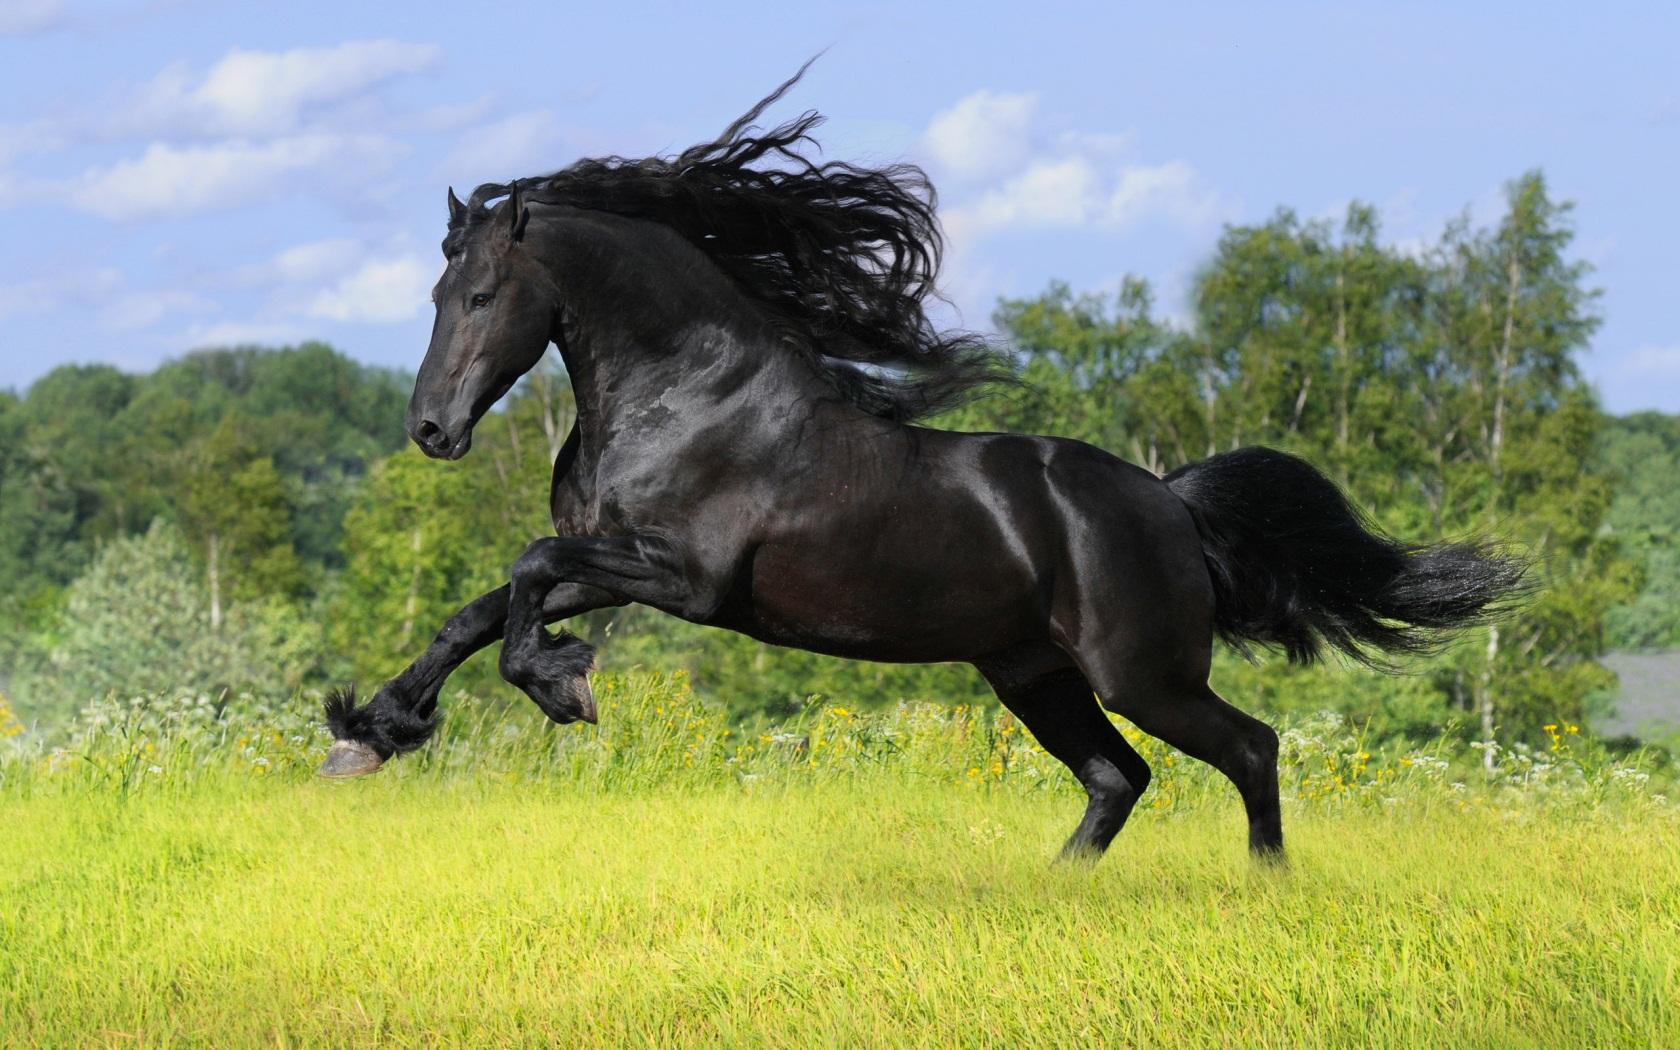 wild animals black horse x desktop 572088 wallpaper wallpaper